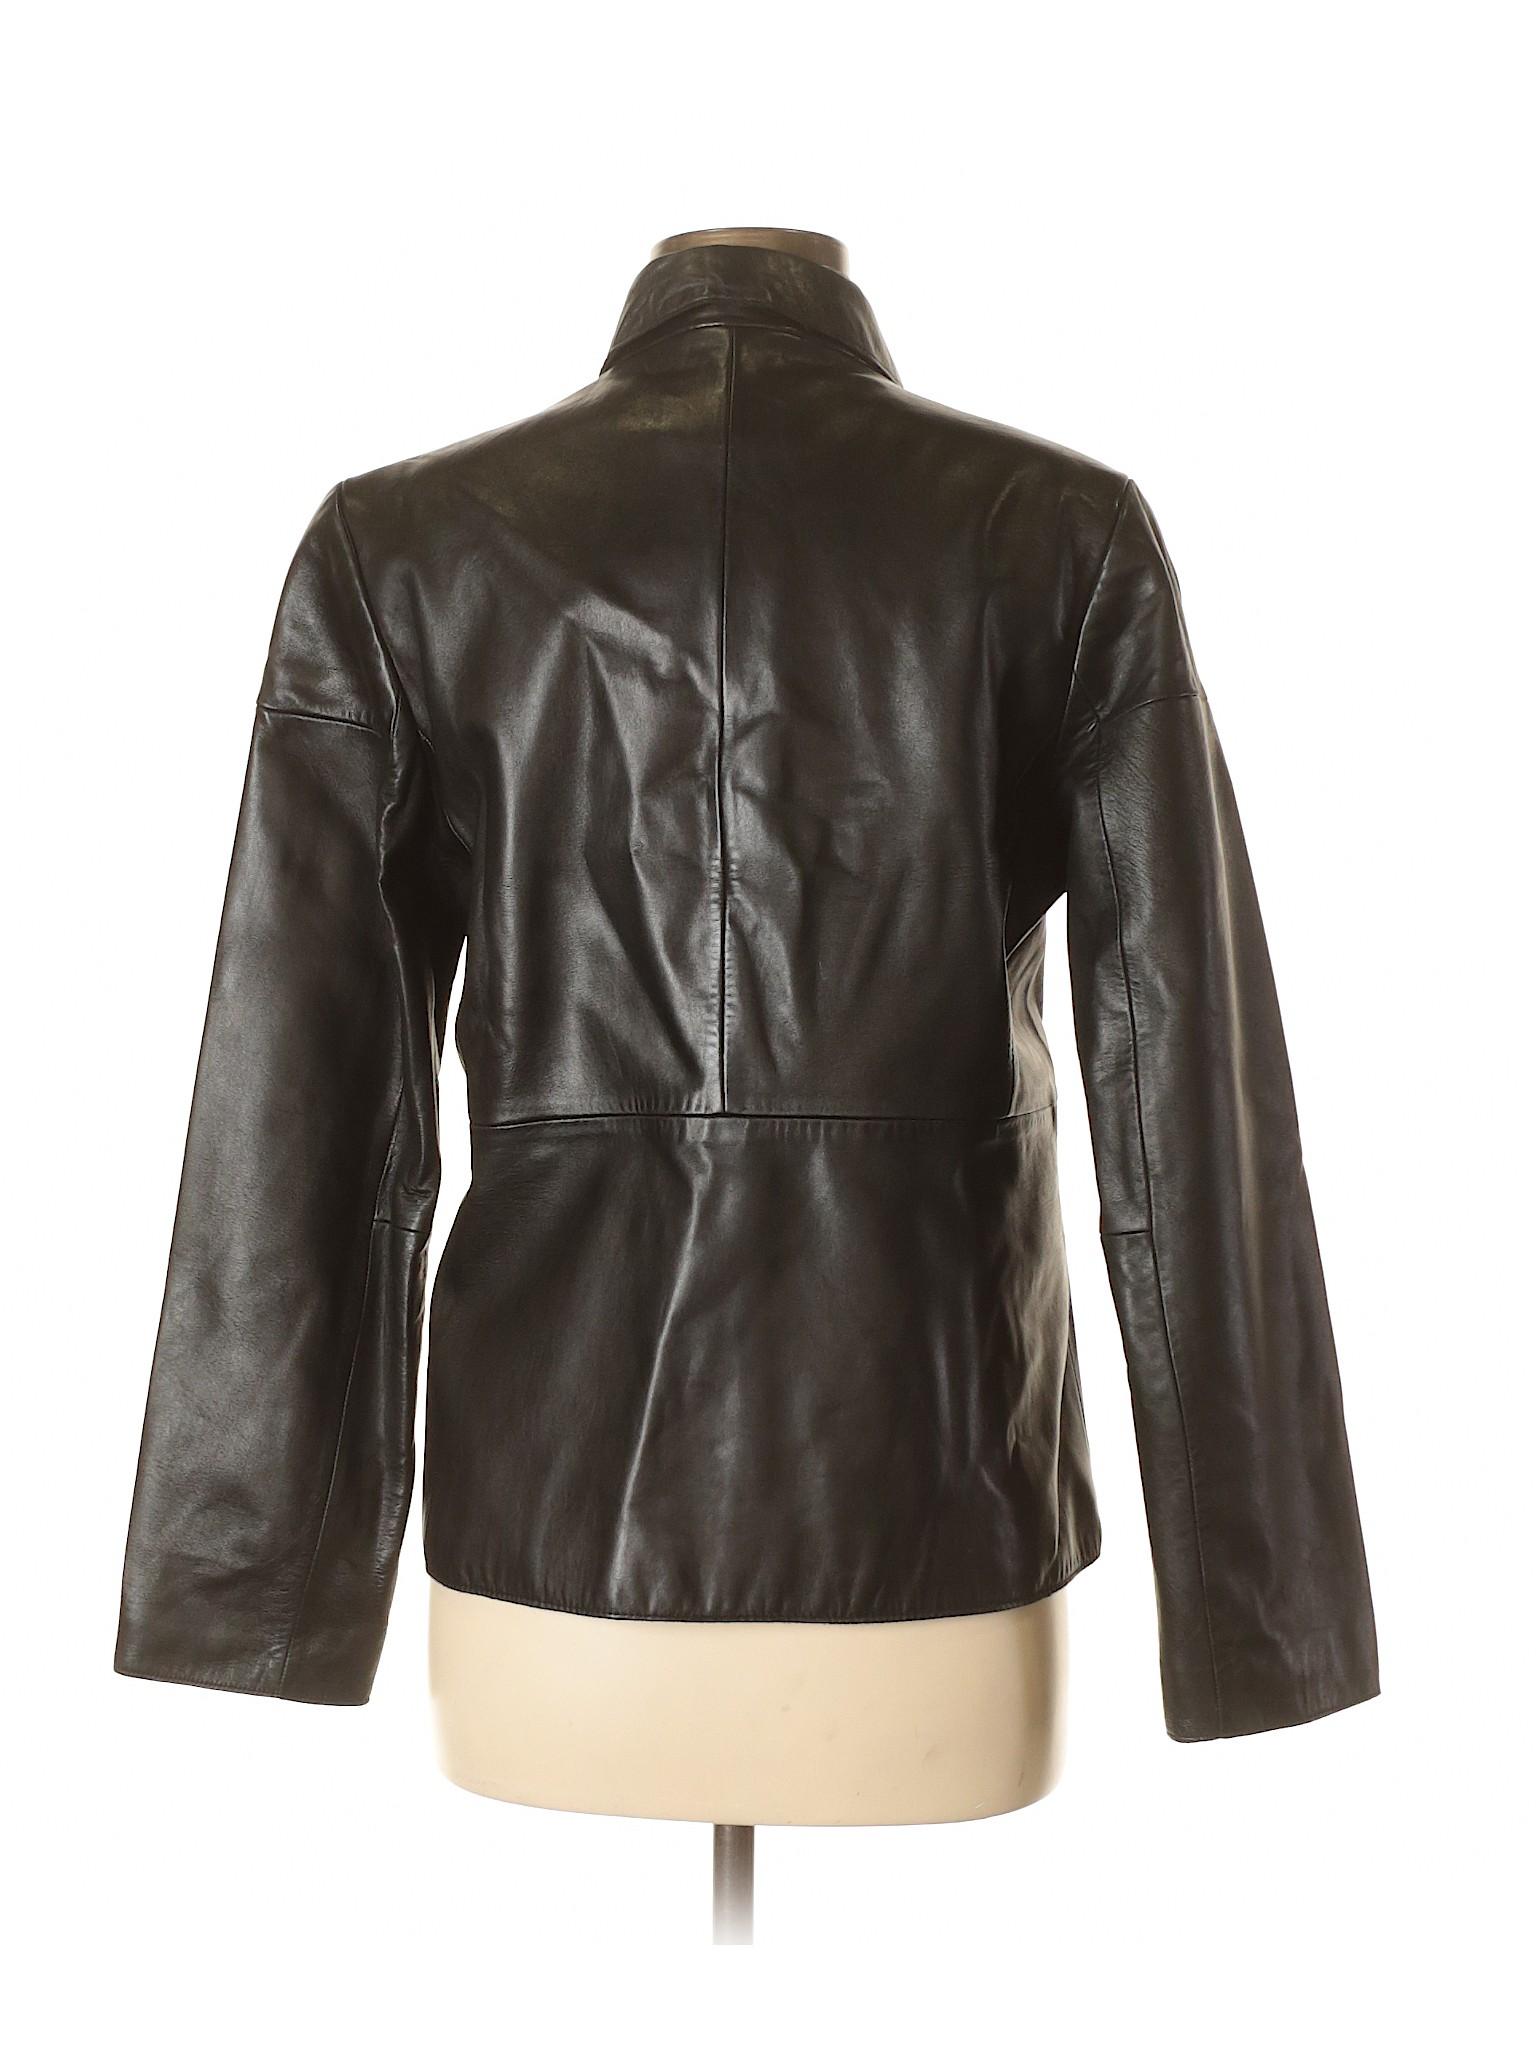 winter Jacket Banana Leather Boutique Republic wFxPdSPqYp